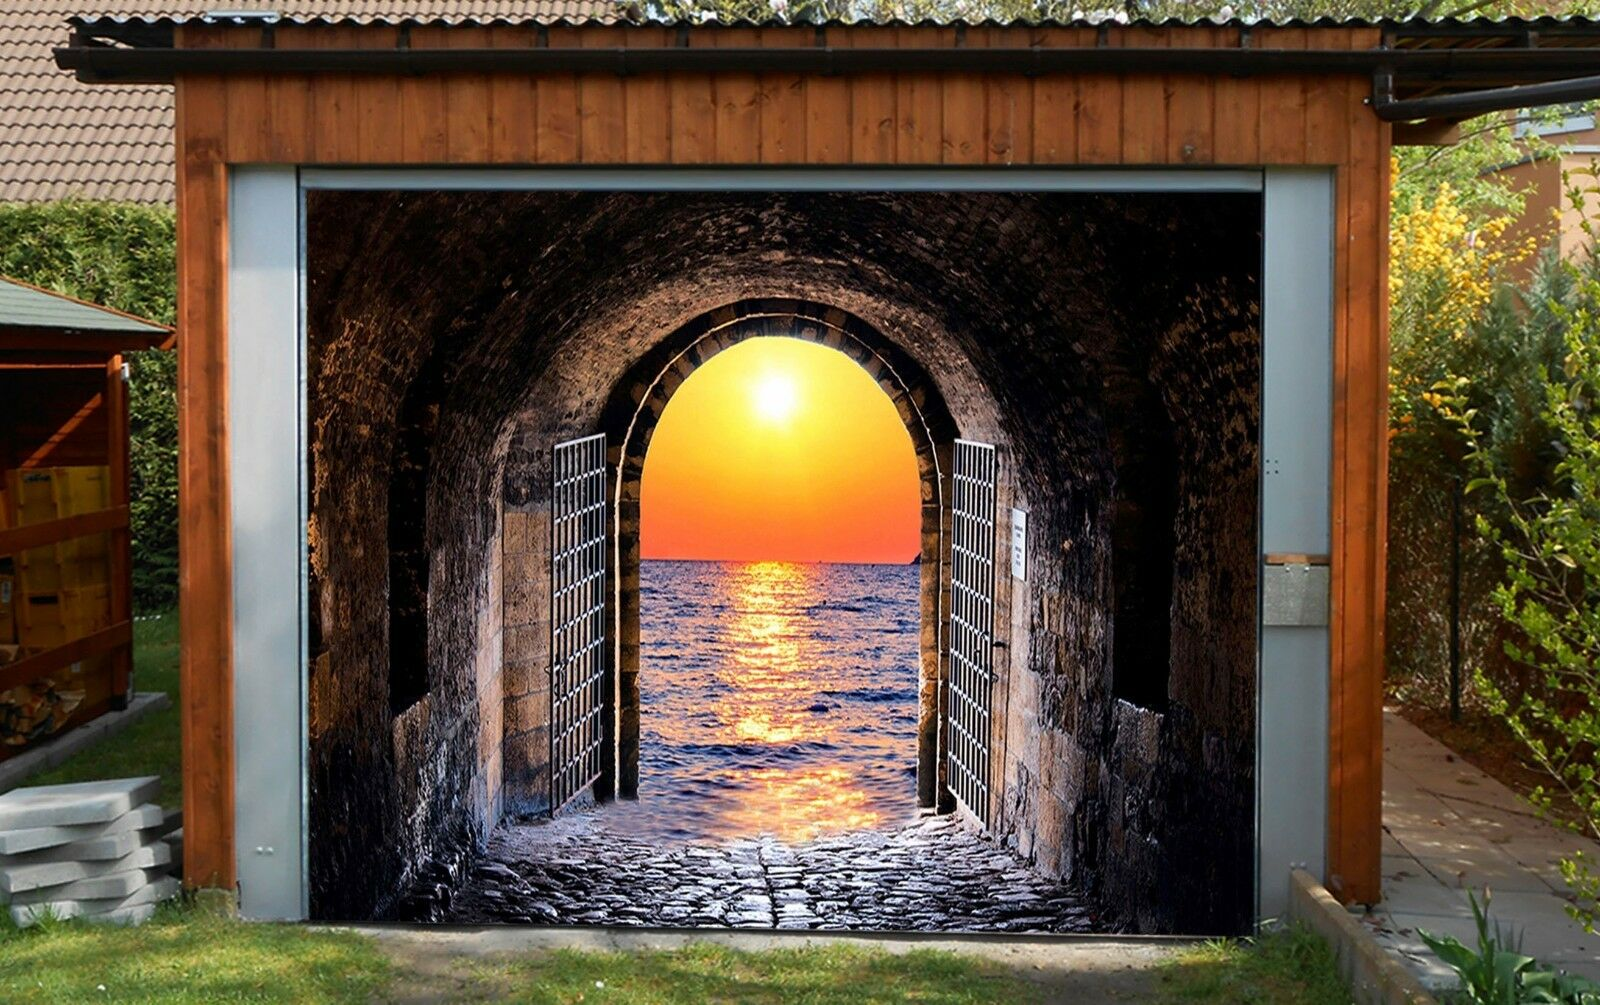 3D Sunrise Cave 4 Garage Door Murals Wall Print Decal Wall AJ WALLPAPER AU Lemon